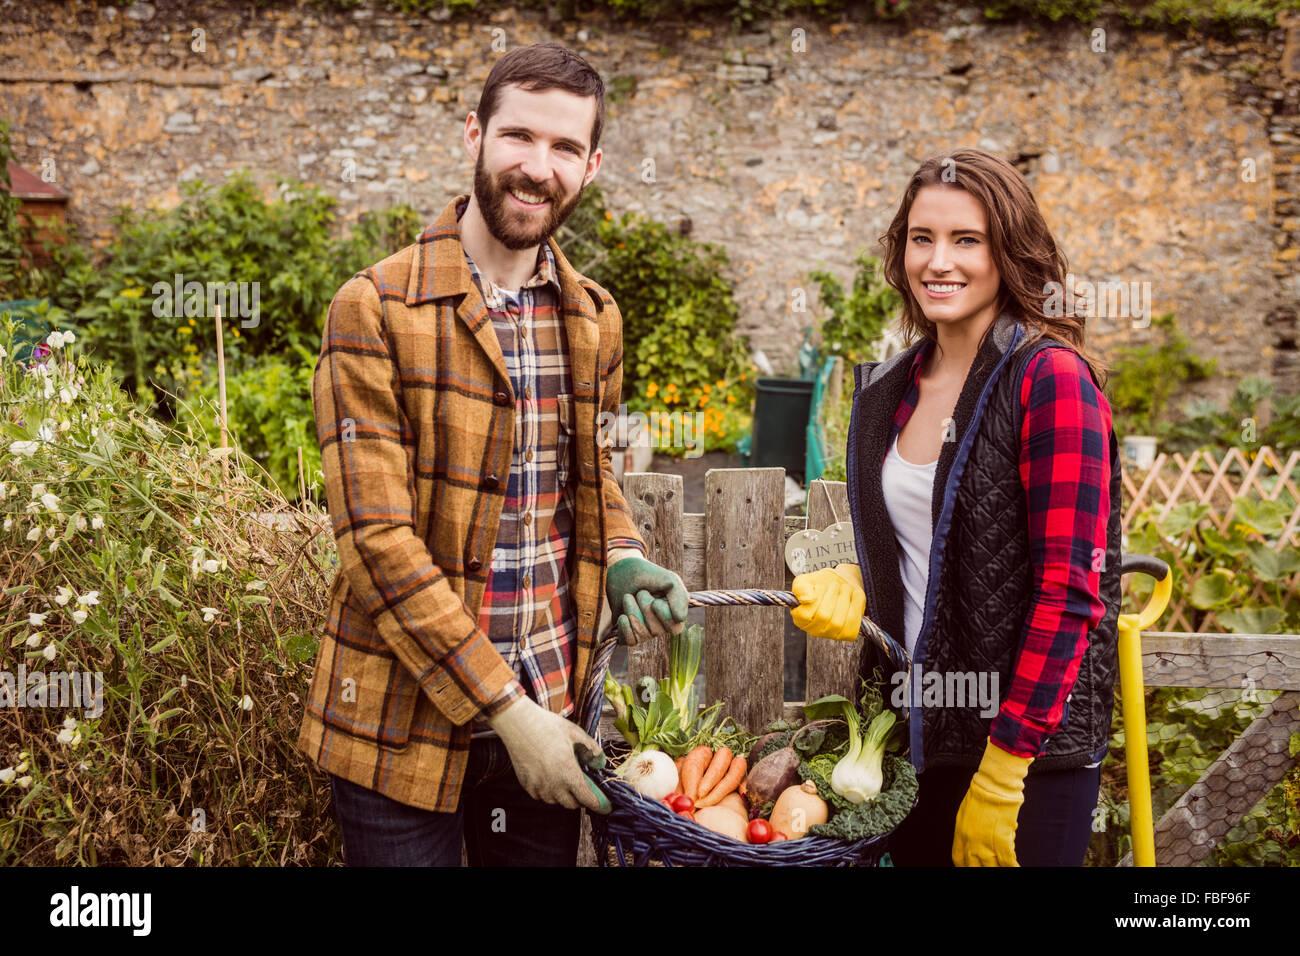 Proud couple showing basket of vegetable - Stock Image